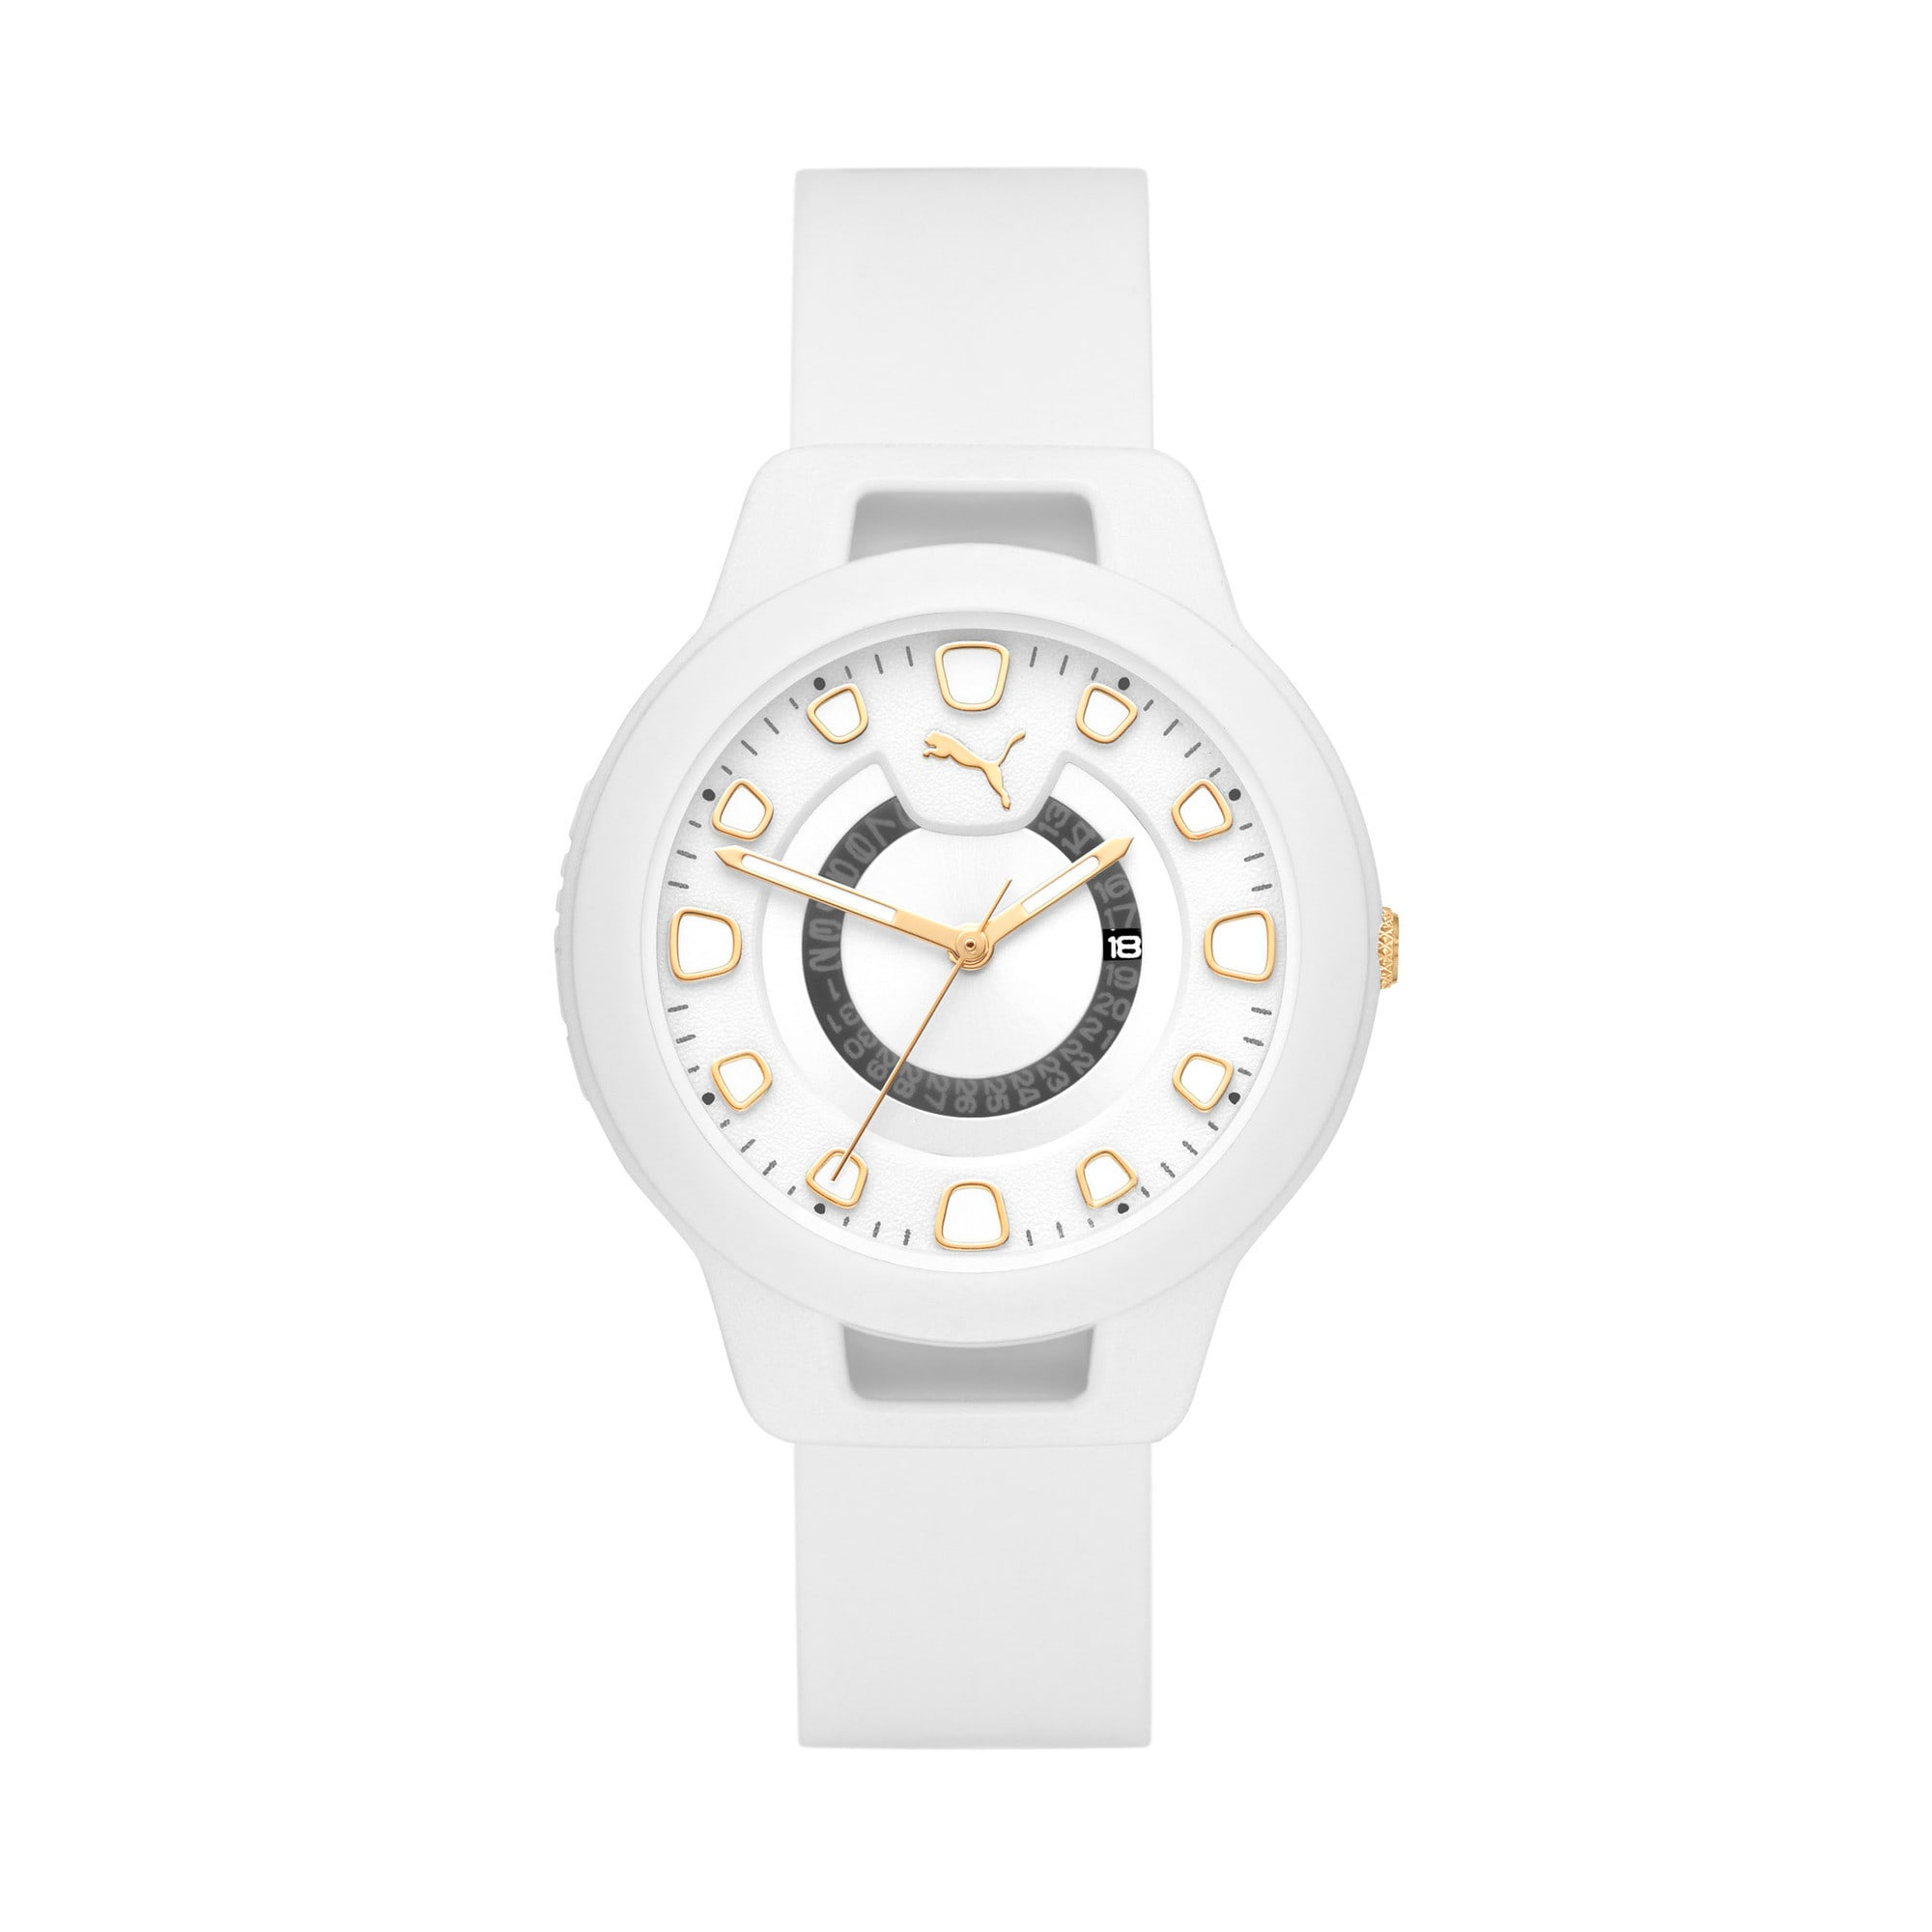 Thumbnail 1 of Reset v1 Watch, White/White, medium